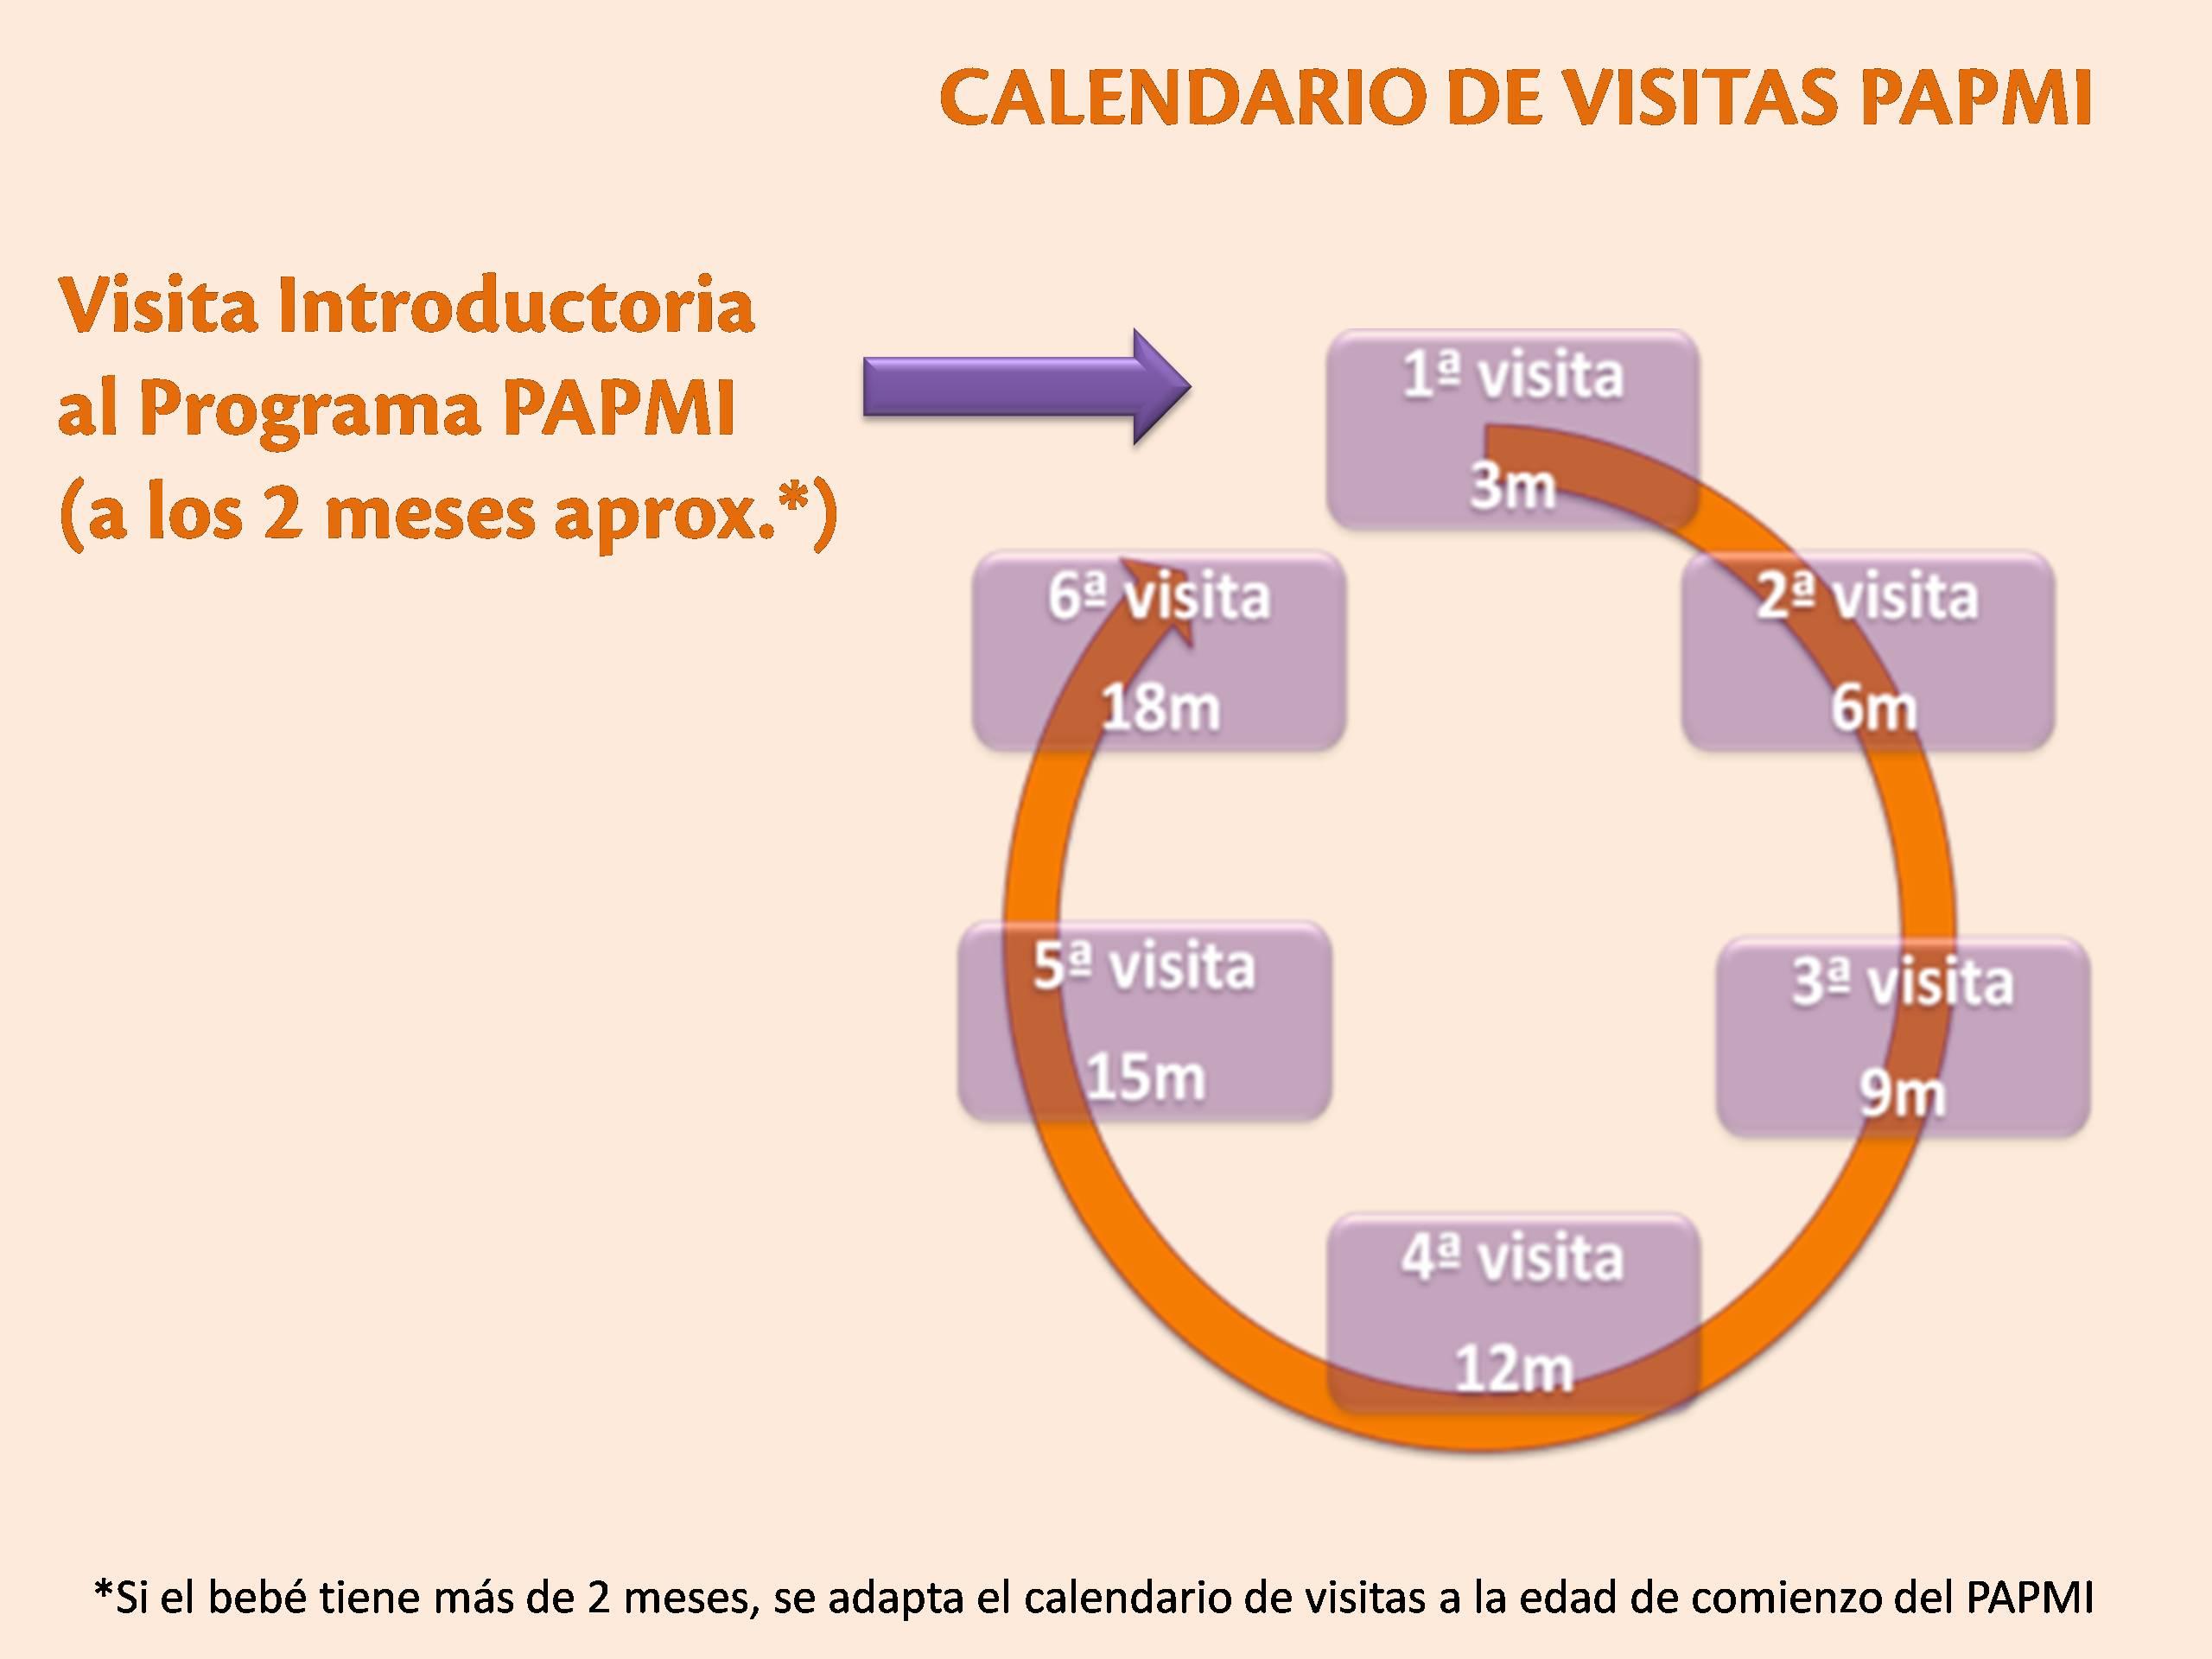 CALENDARIO DE VISITAS IMAGEN